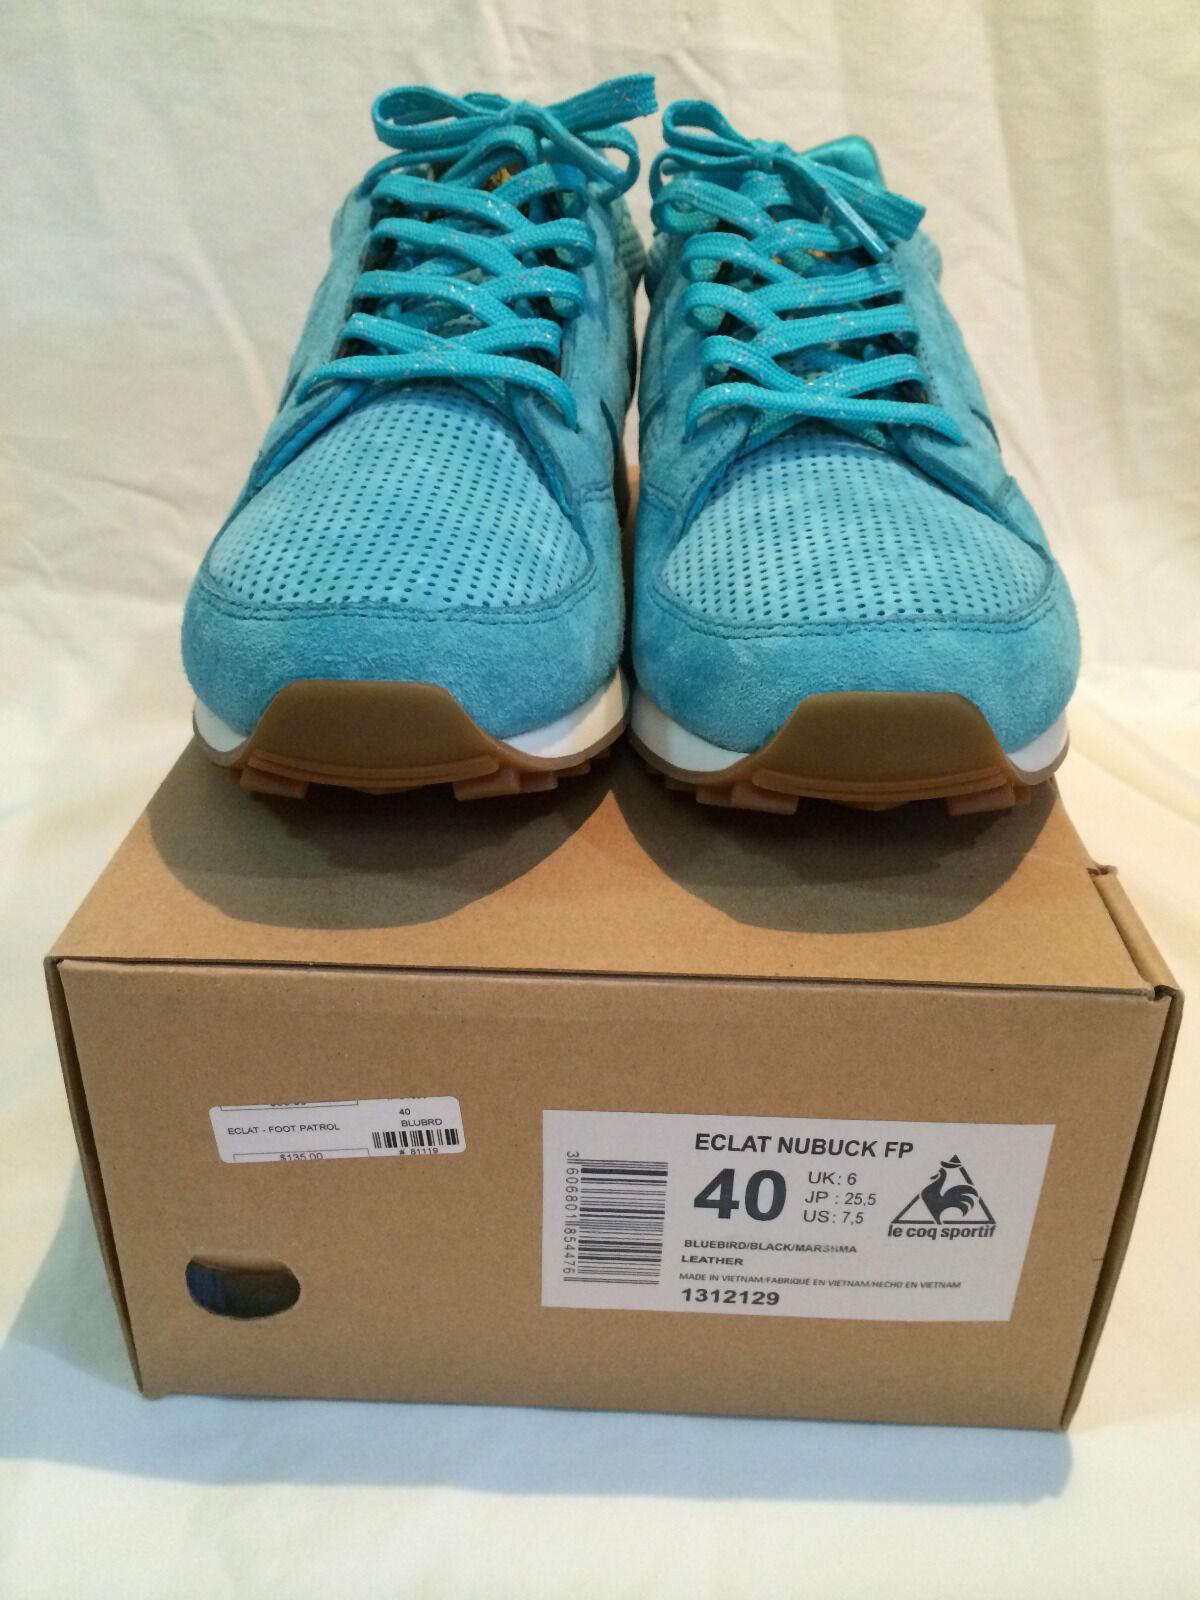 LE COQ SPORTIF Eclat X FOOT PATROL Sz US 7.5 UK6 EU40 Marcaron 1312129 2013